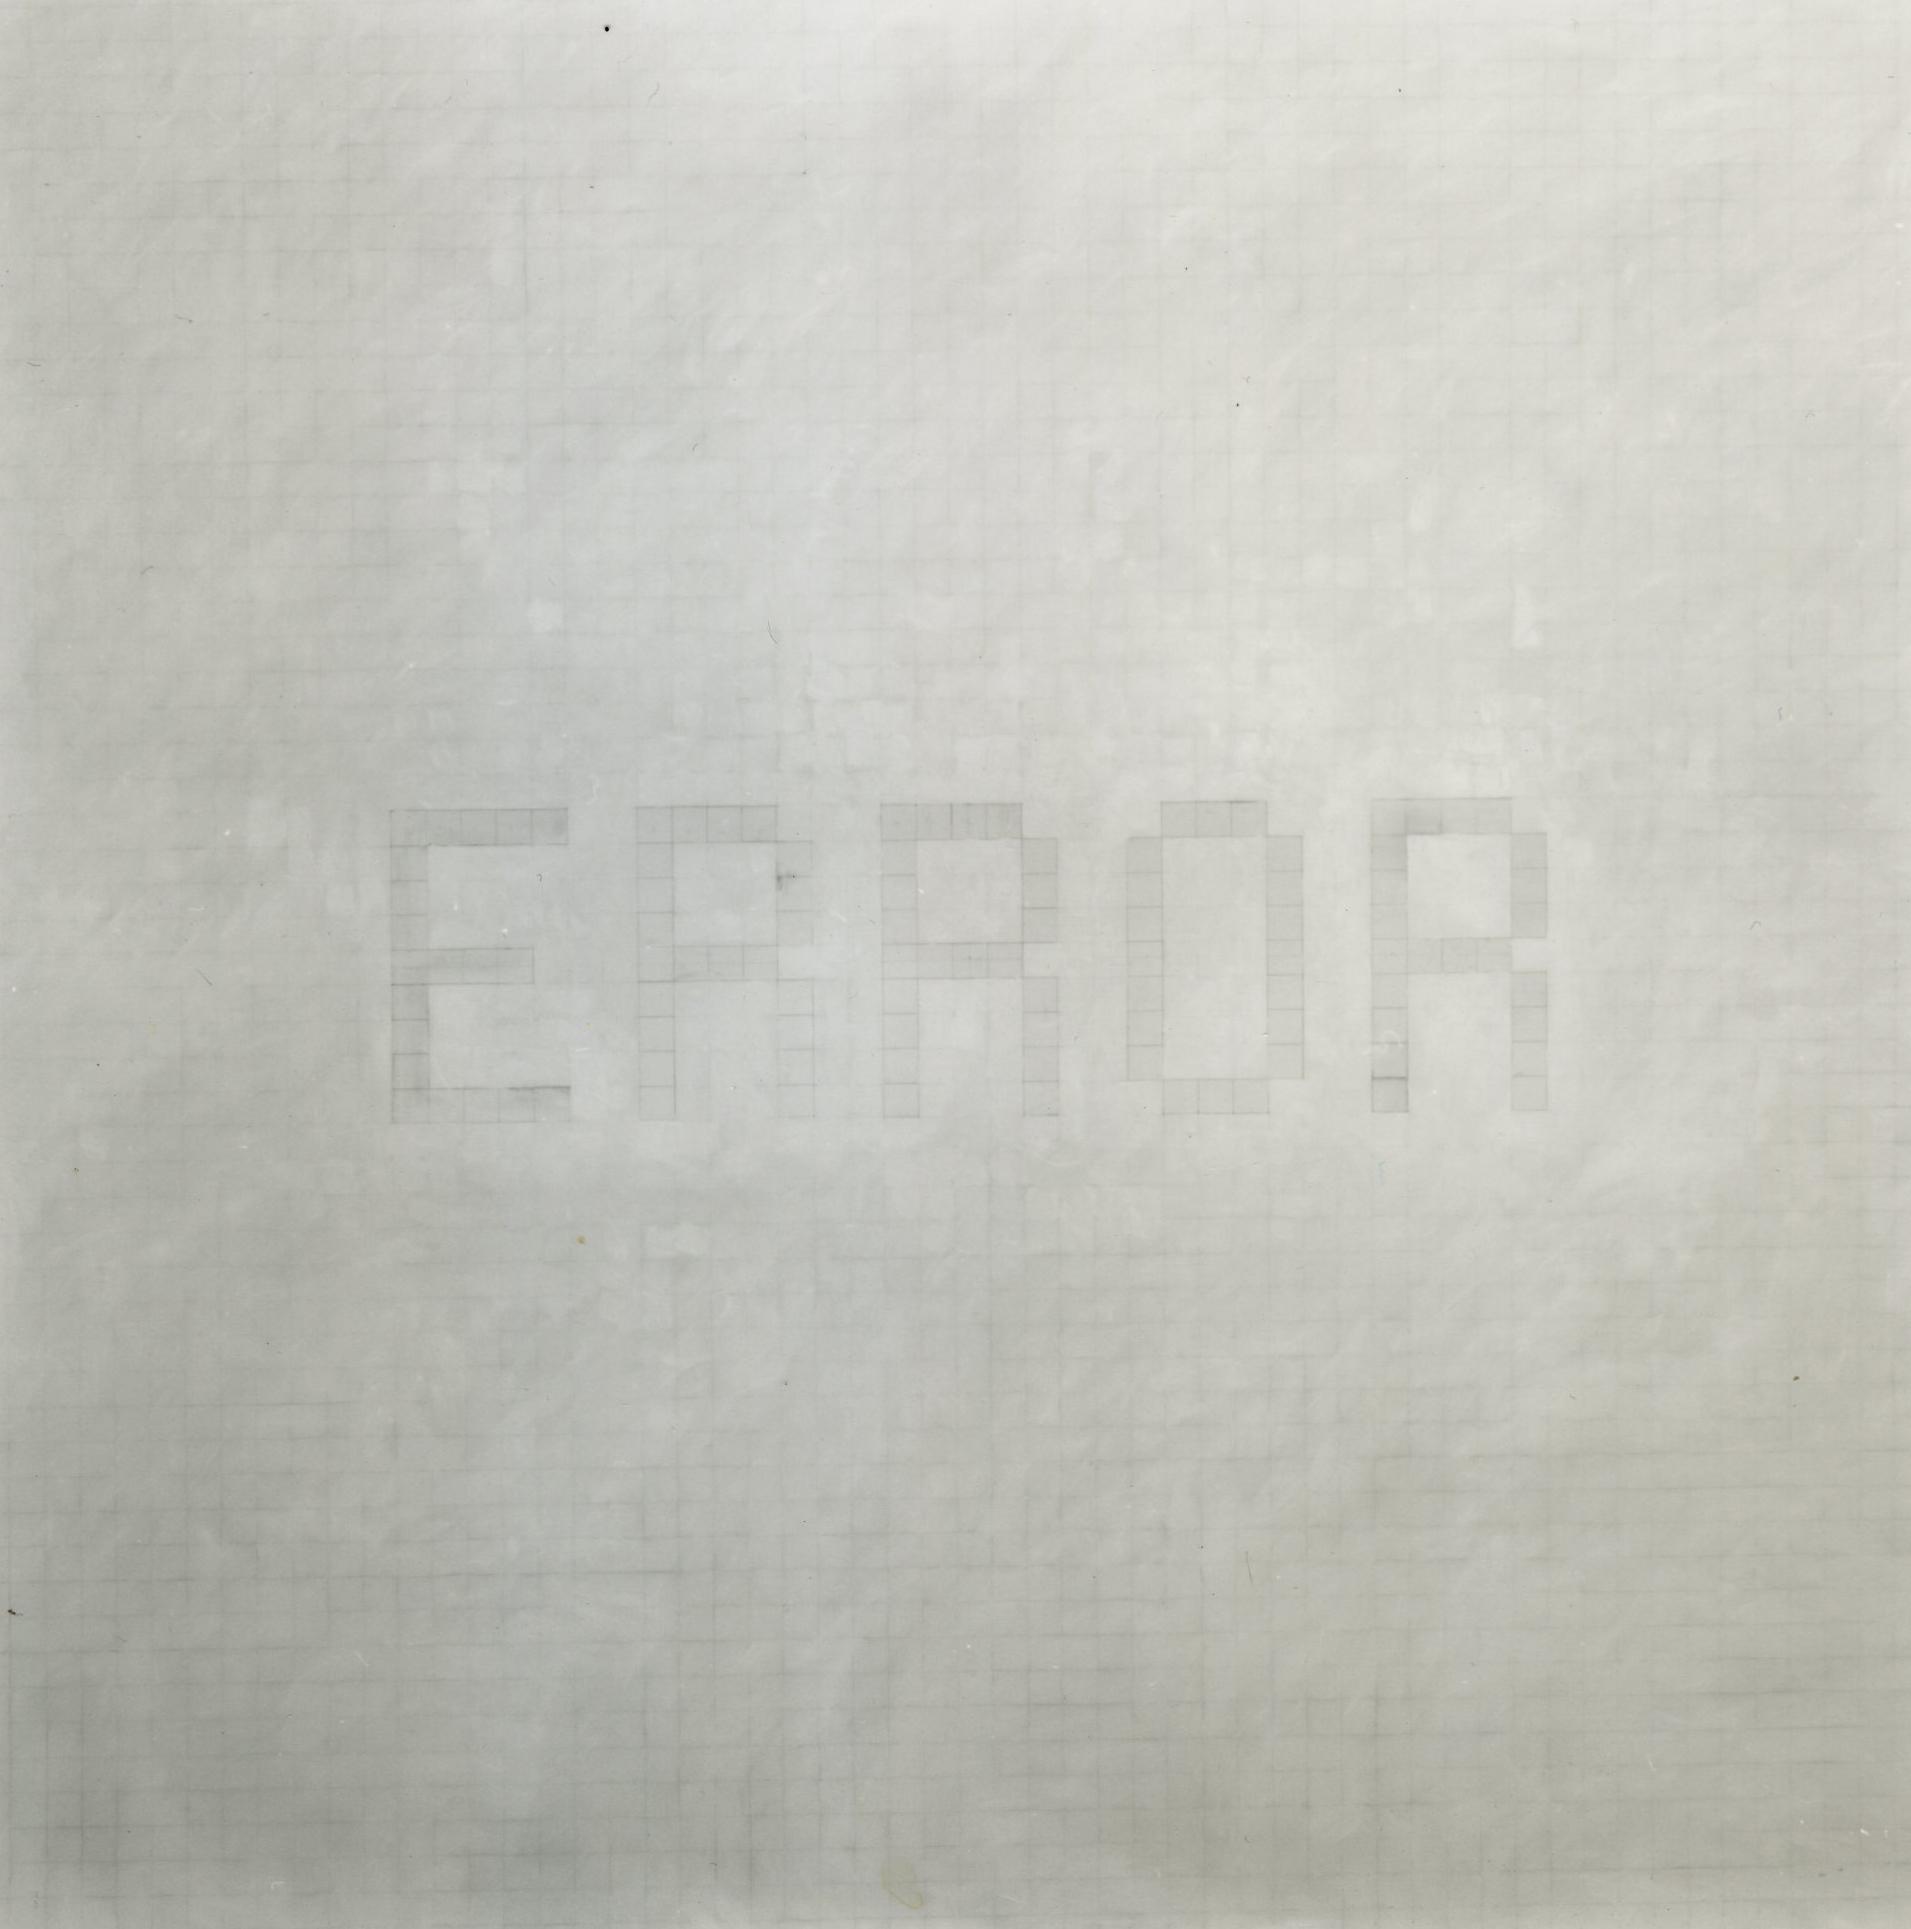 Pancrazzi, Error, 2000, grafite su carta su tela, 200×200 cm